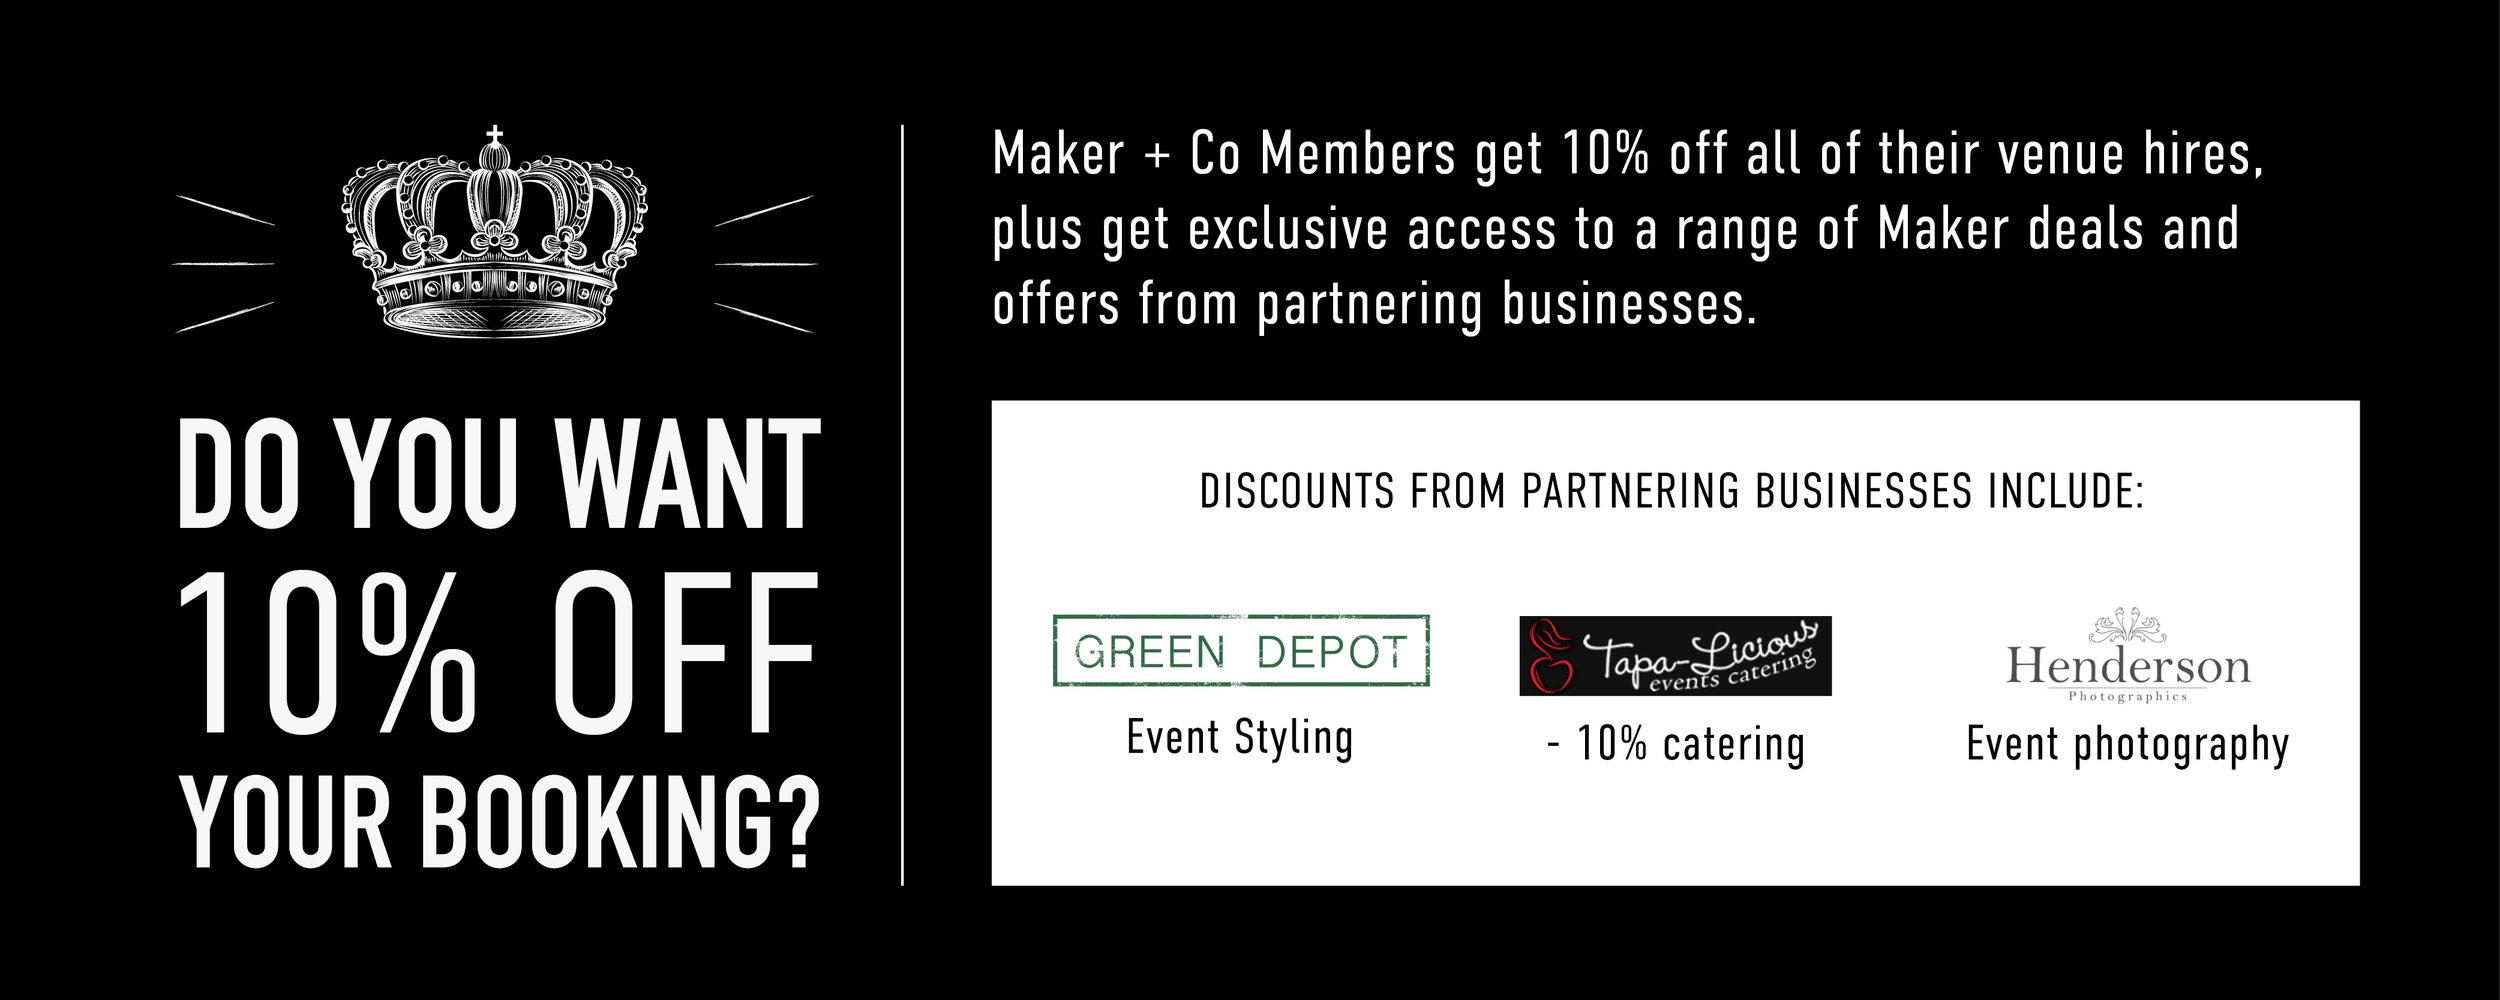 member_discount_venuebanner.jpg